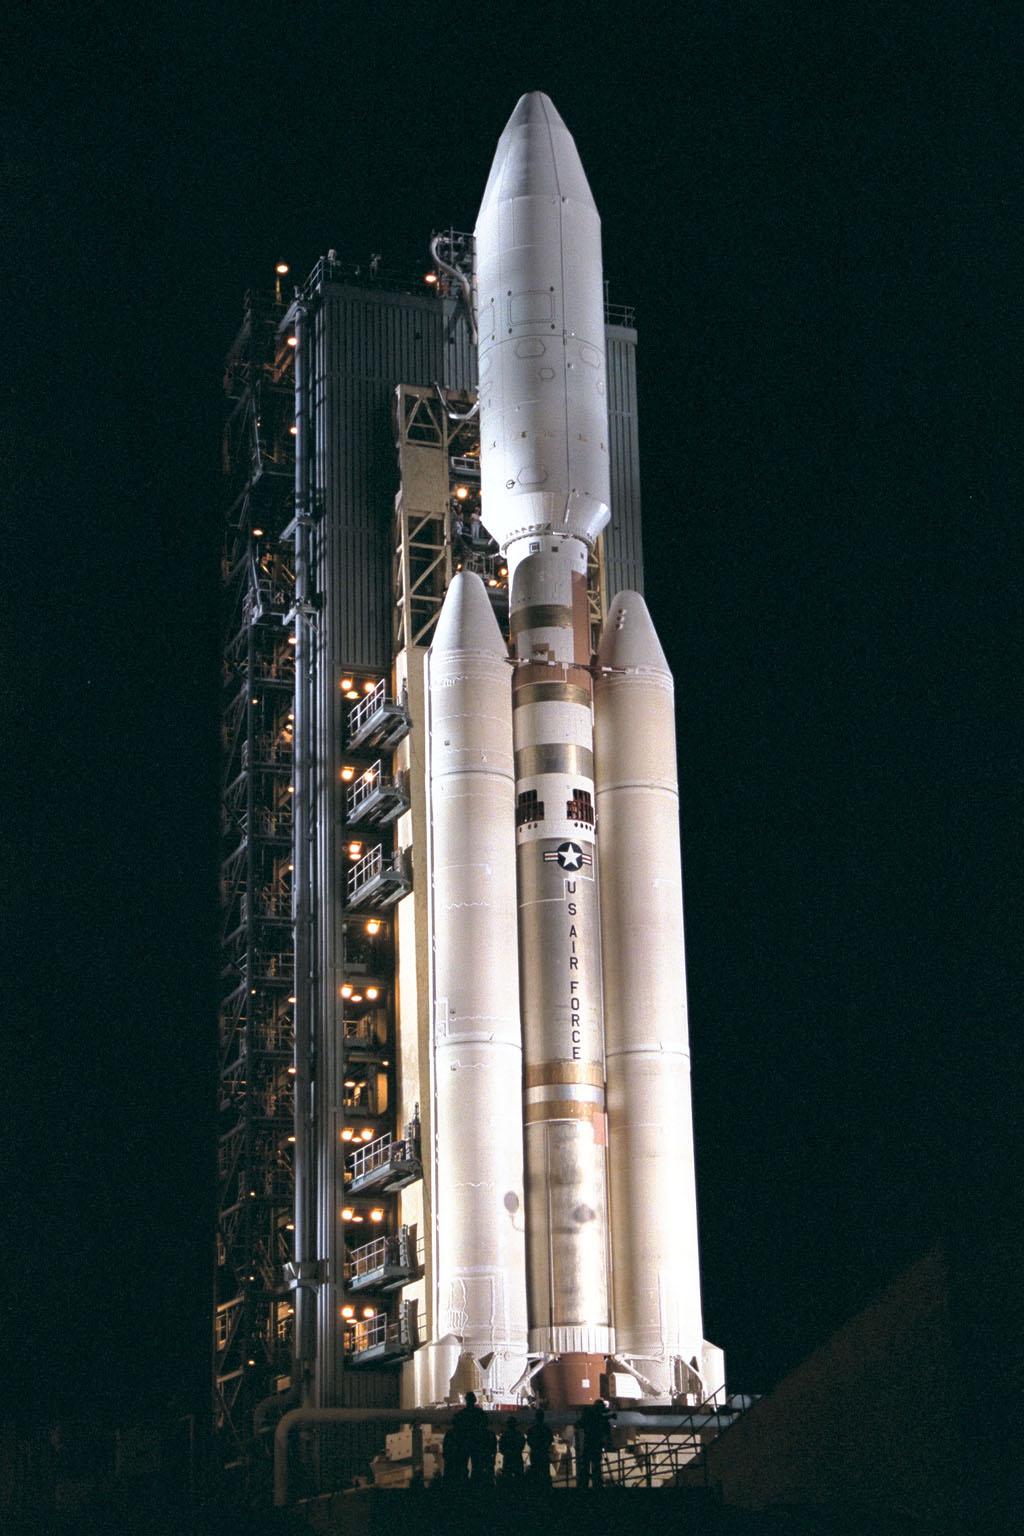 cassini probe launch - photo #7